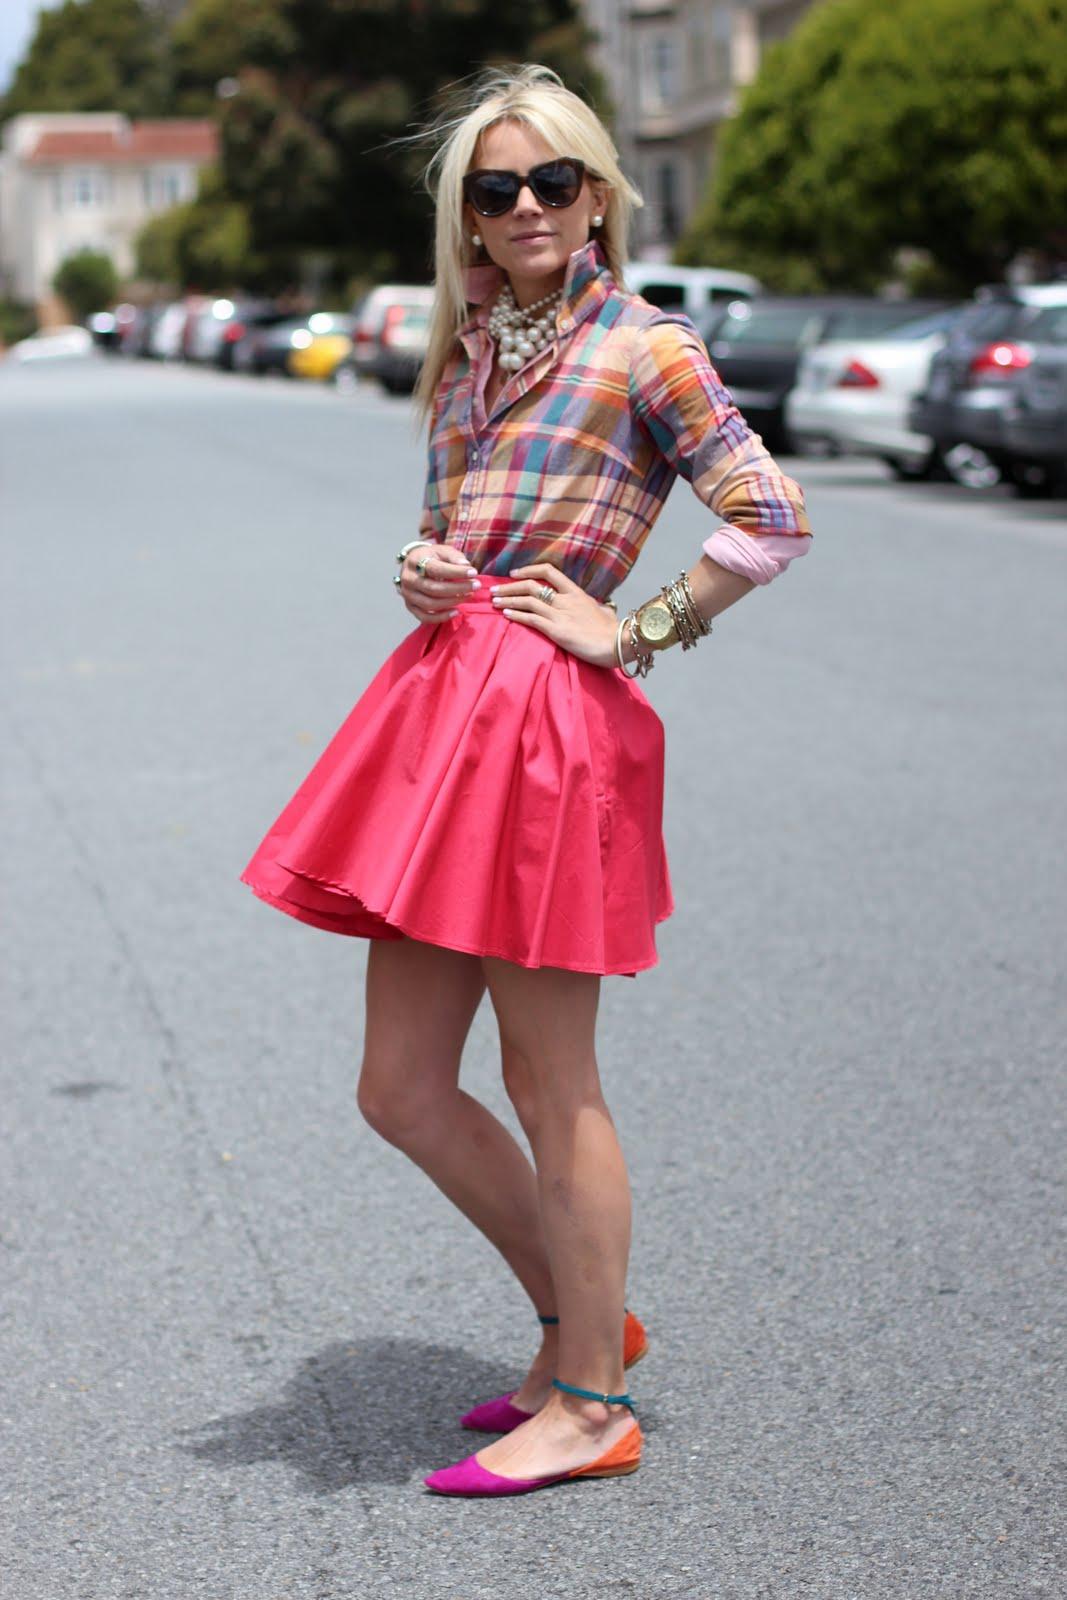 Розовая мини юбка на девушке фото 2 фотография